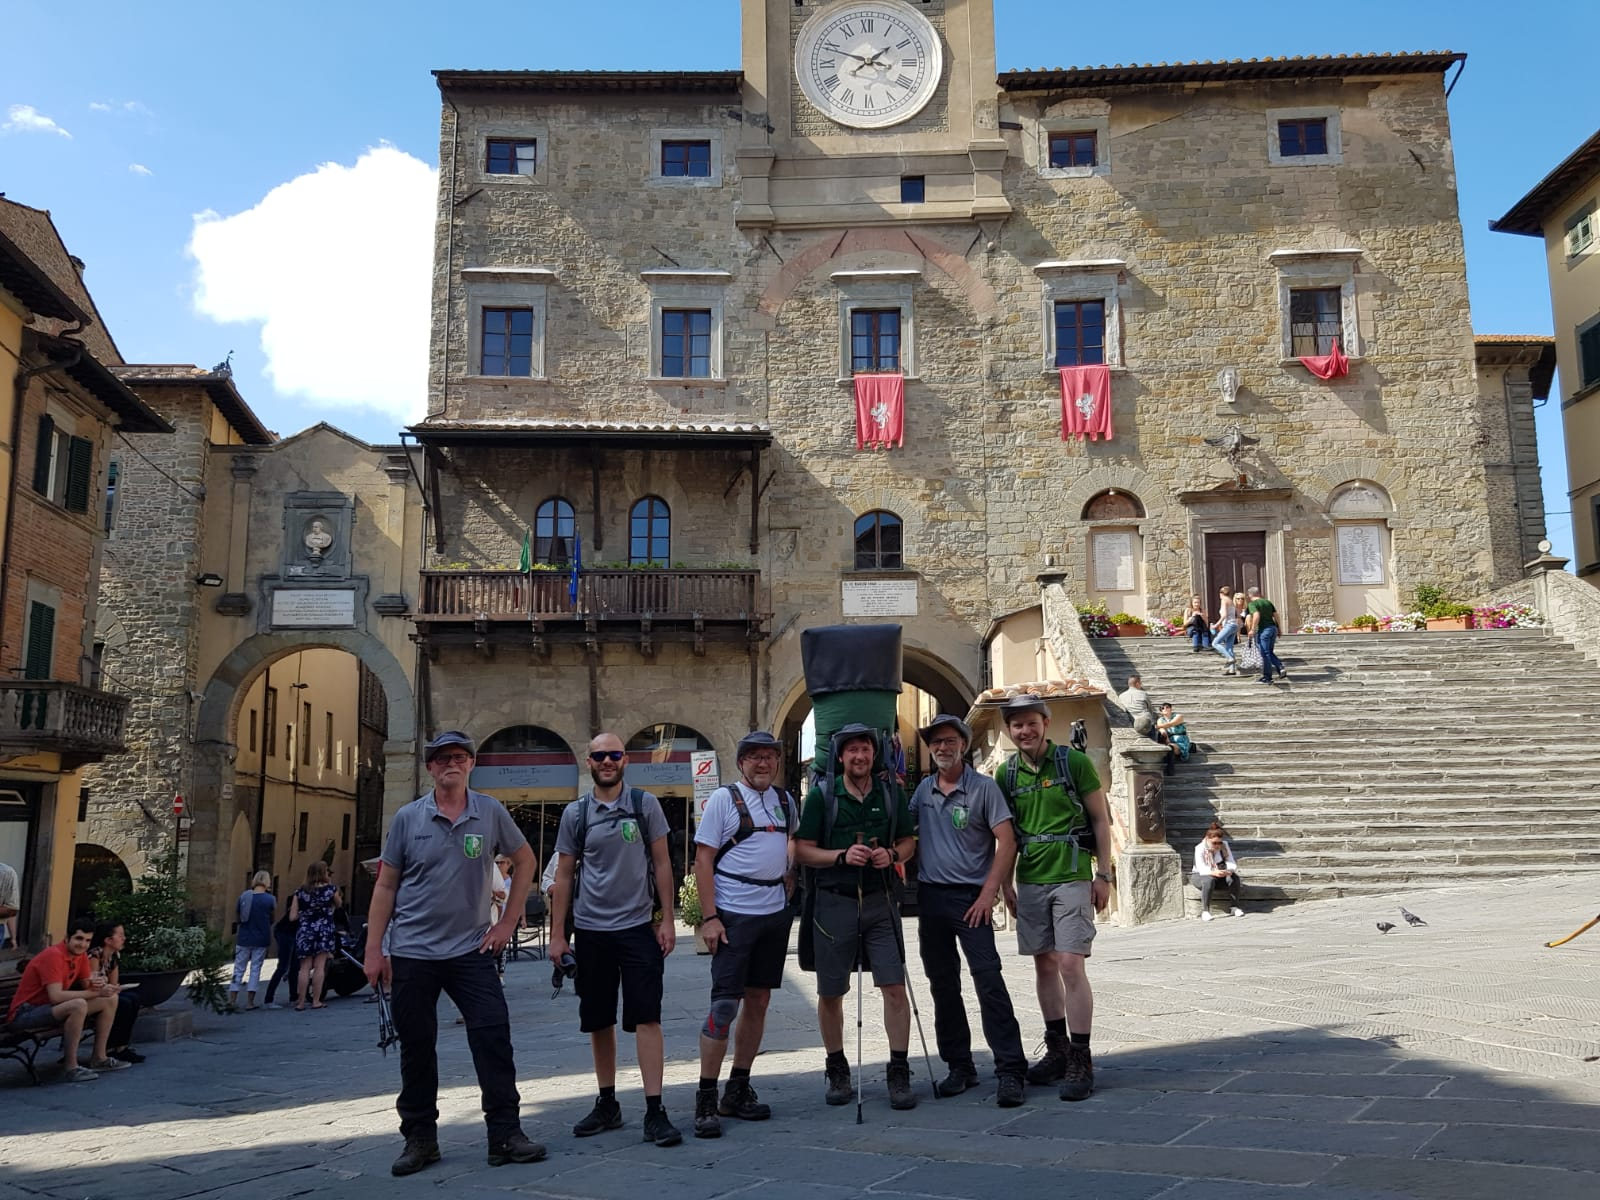 GSB- Tagebuch 29.09.19 – Mit den Seeblickern in Cortona